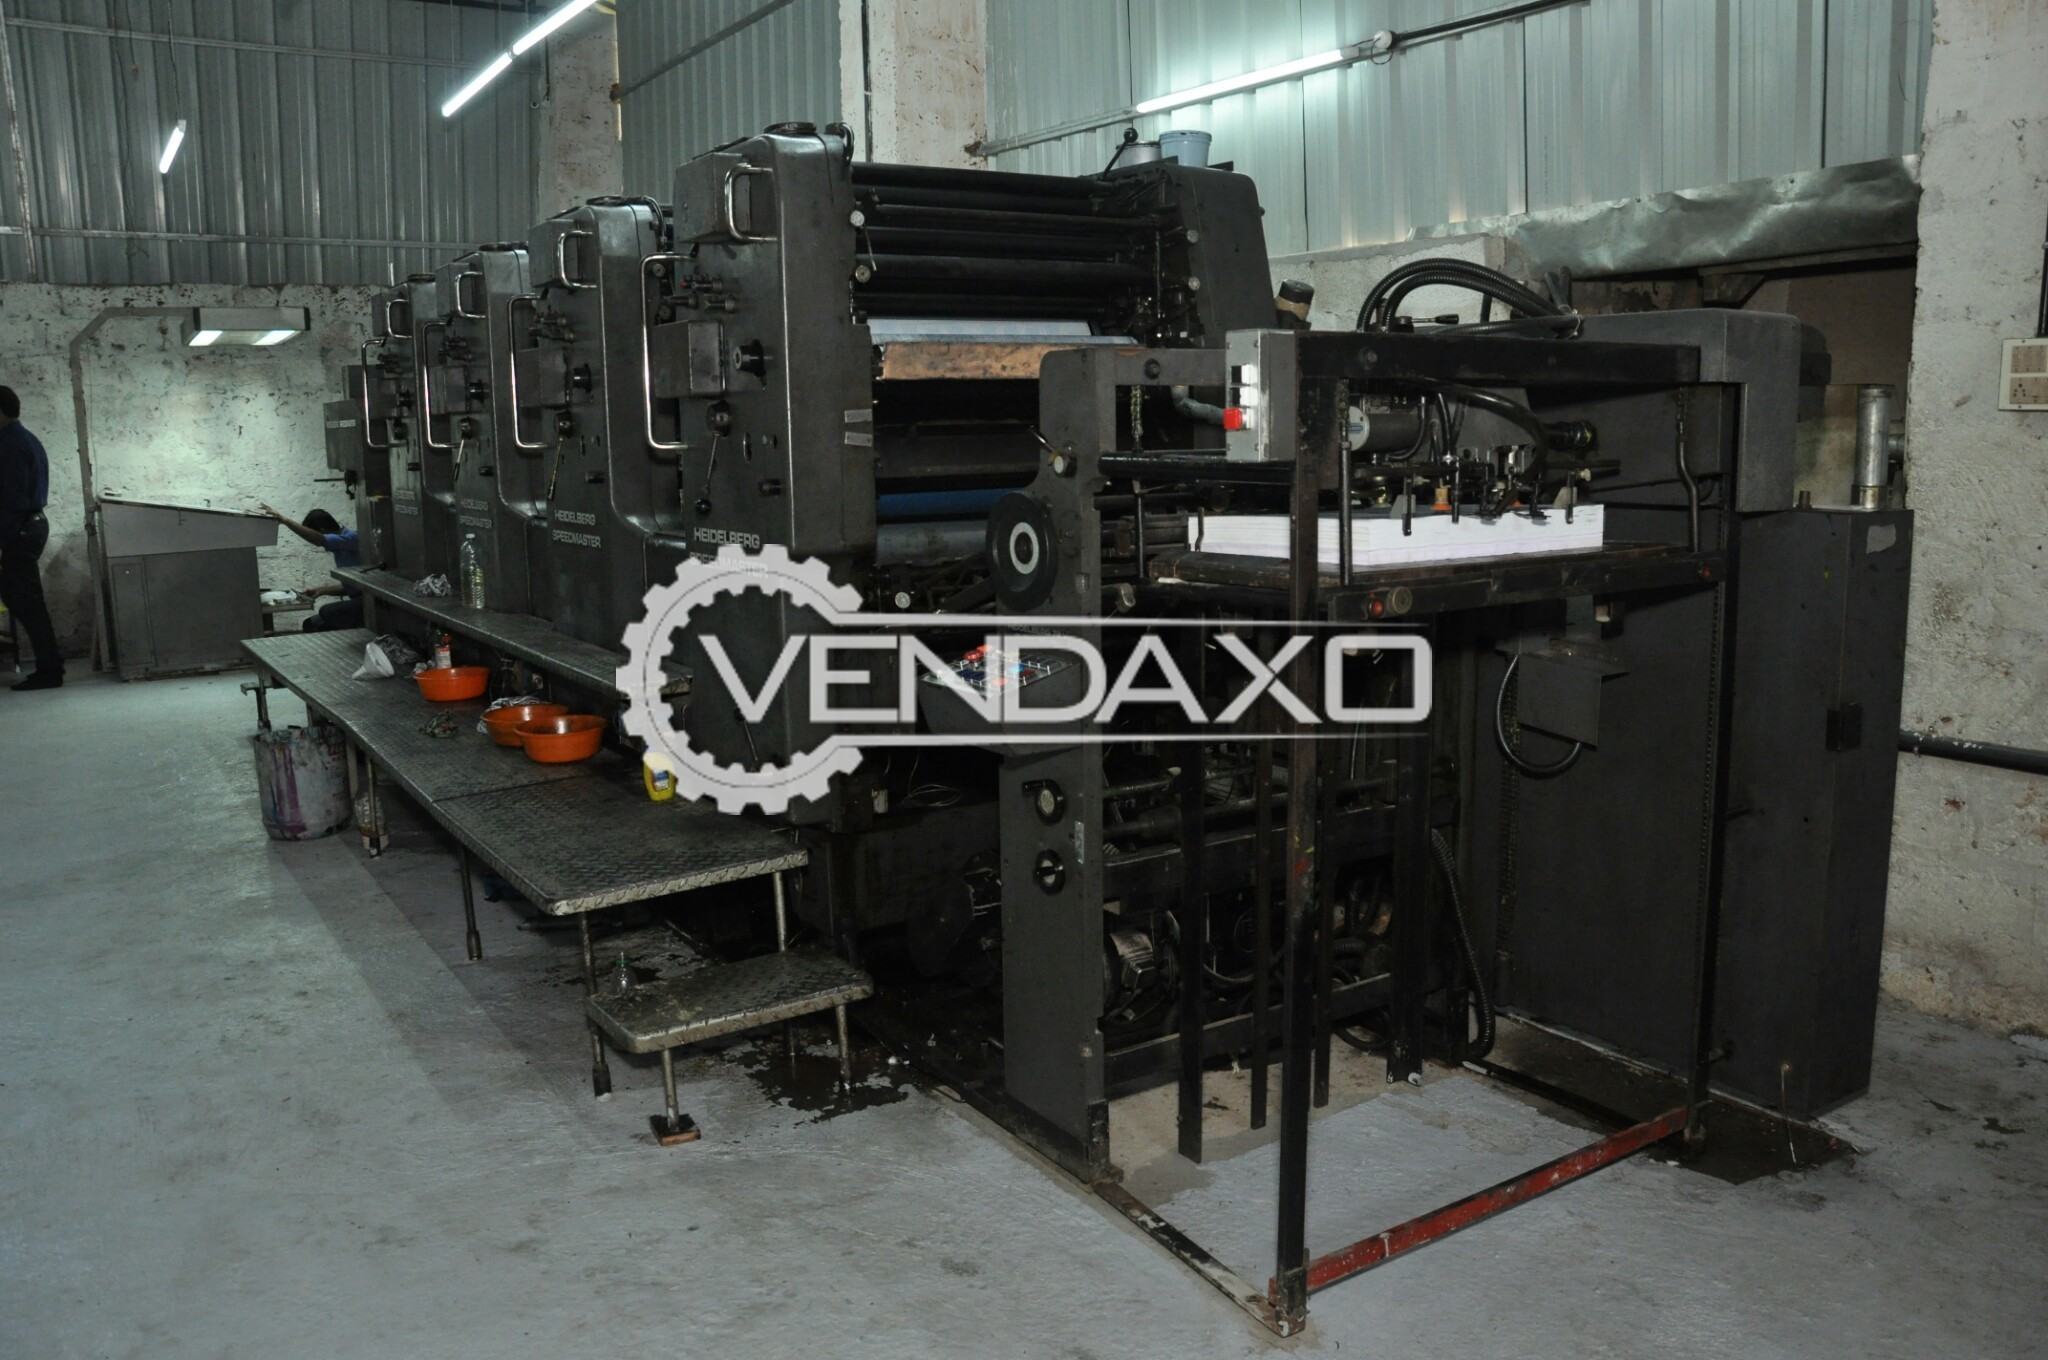 Hiedelberg Speedmaster Printing Machine - 4 Color